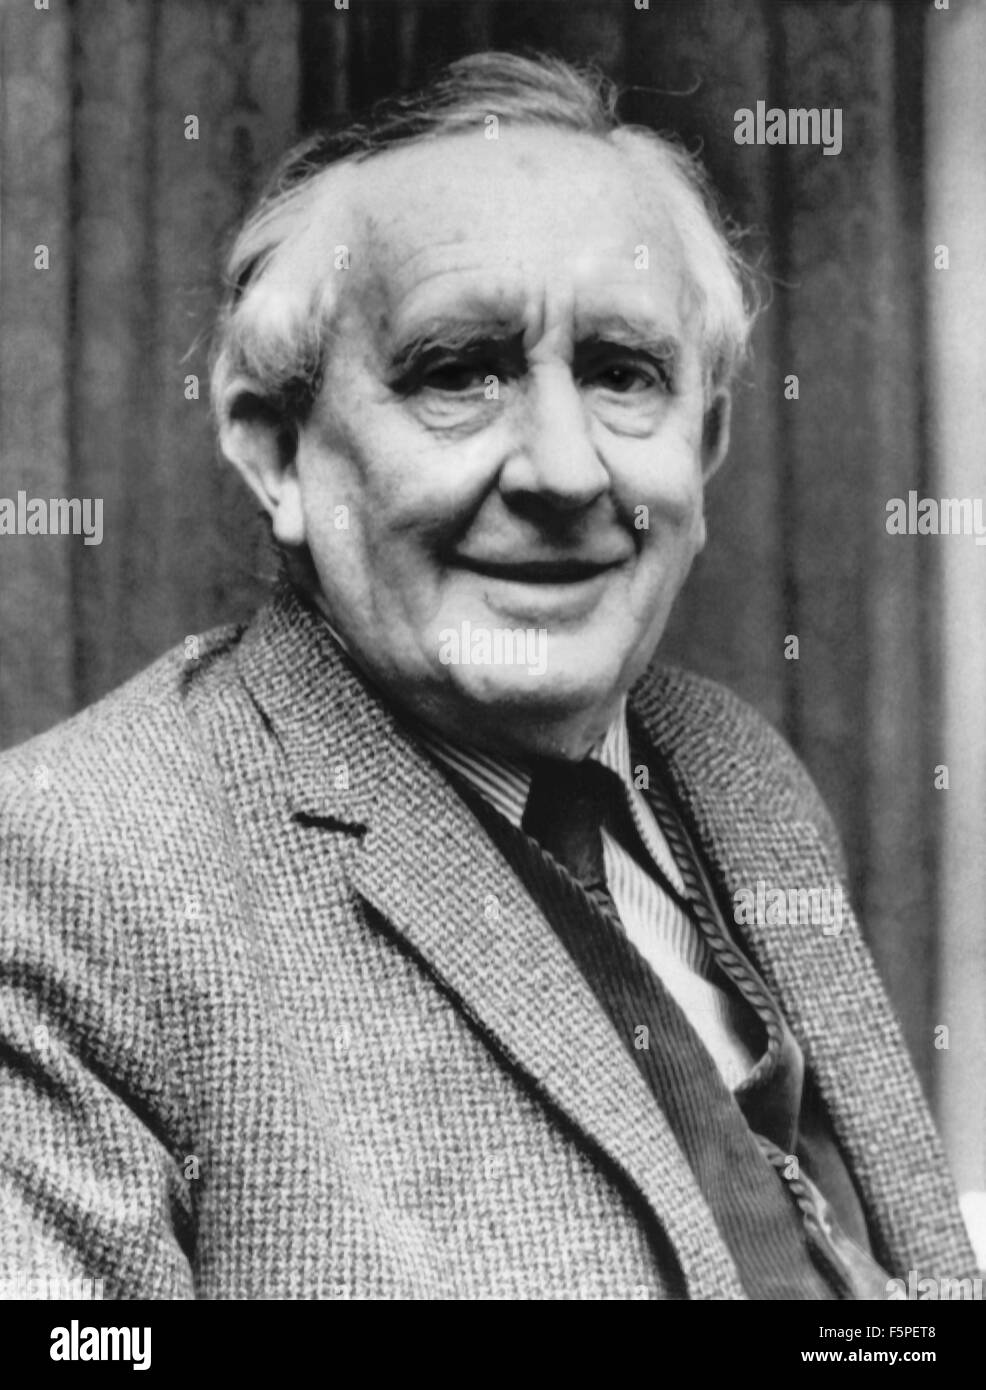 J R Smith Links Black Friday To Slavery On Instagram: J R R Tolkien Stock Photos & J R R Tolkien Stock Images